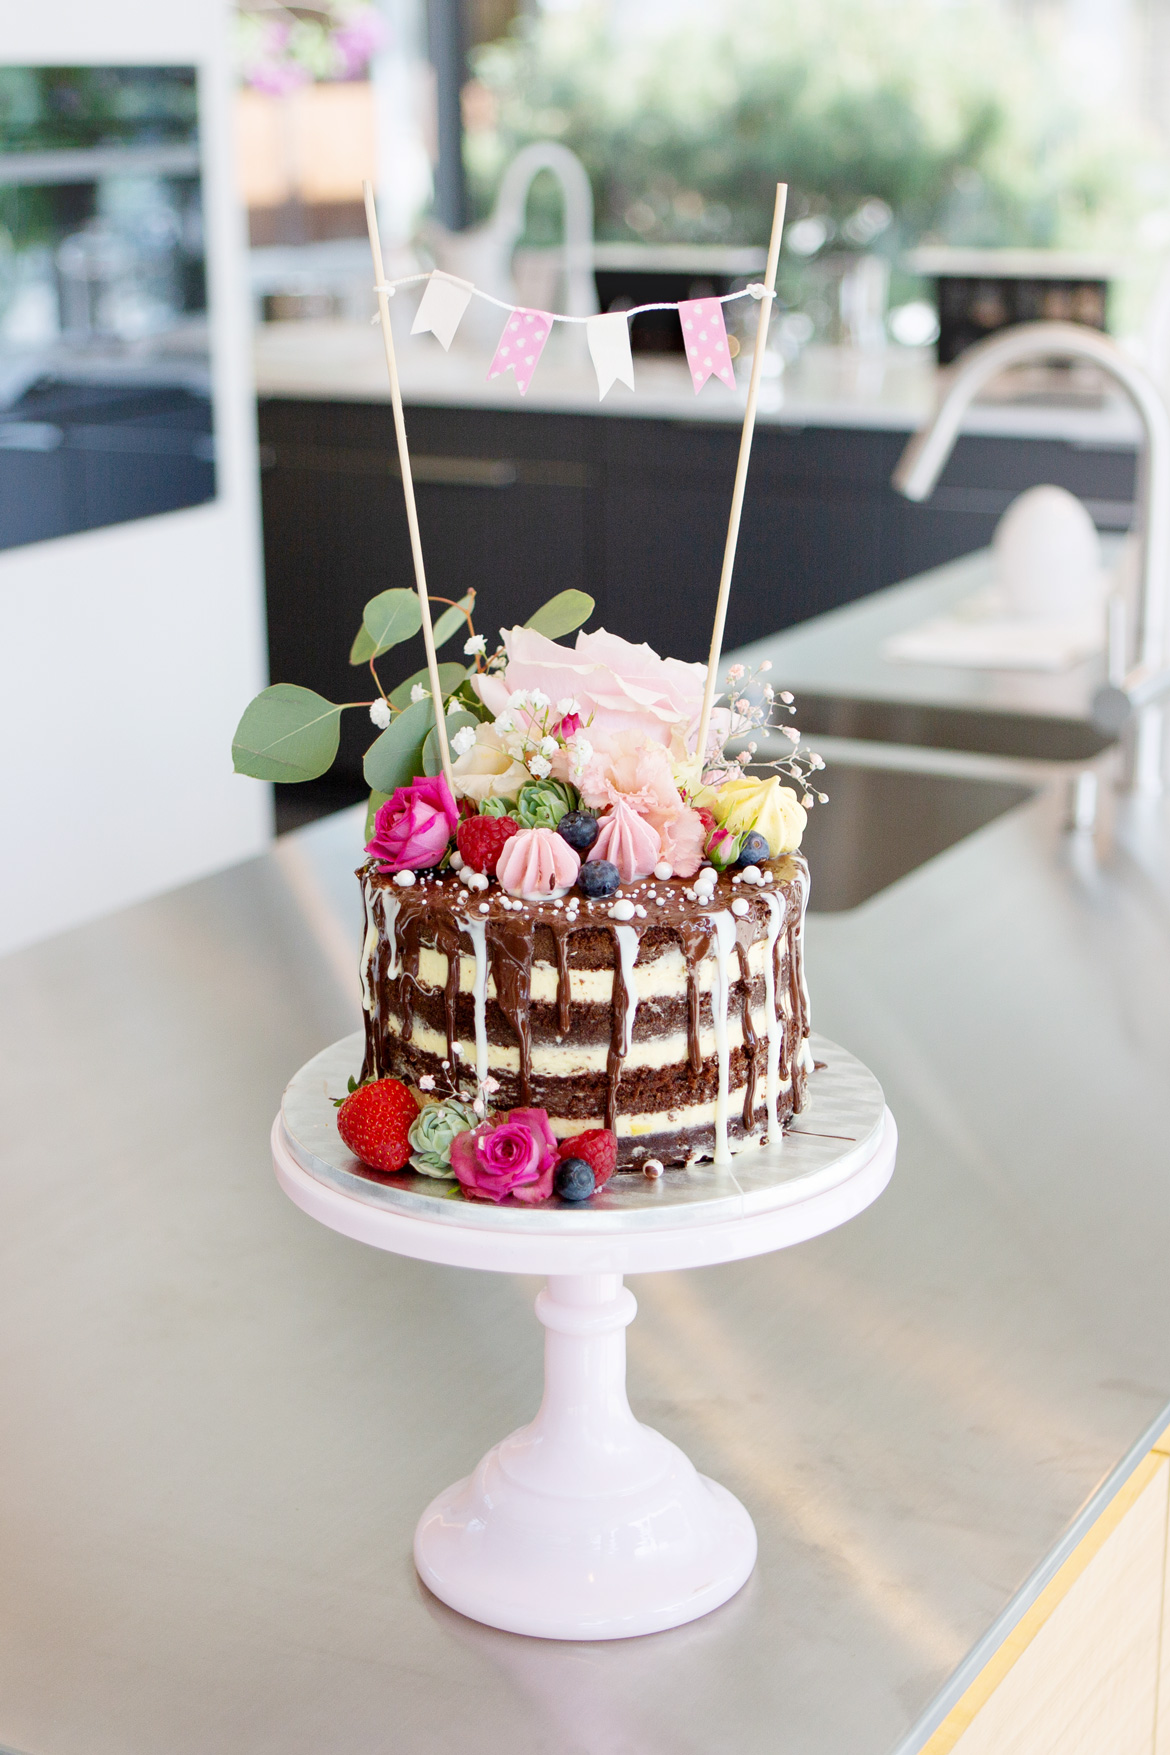 Naked Cake Drip Cake Tortenkurs mit Jenny's Cakes